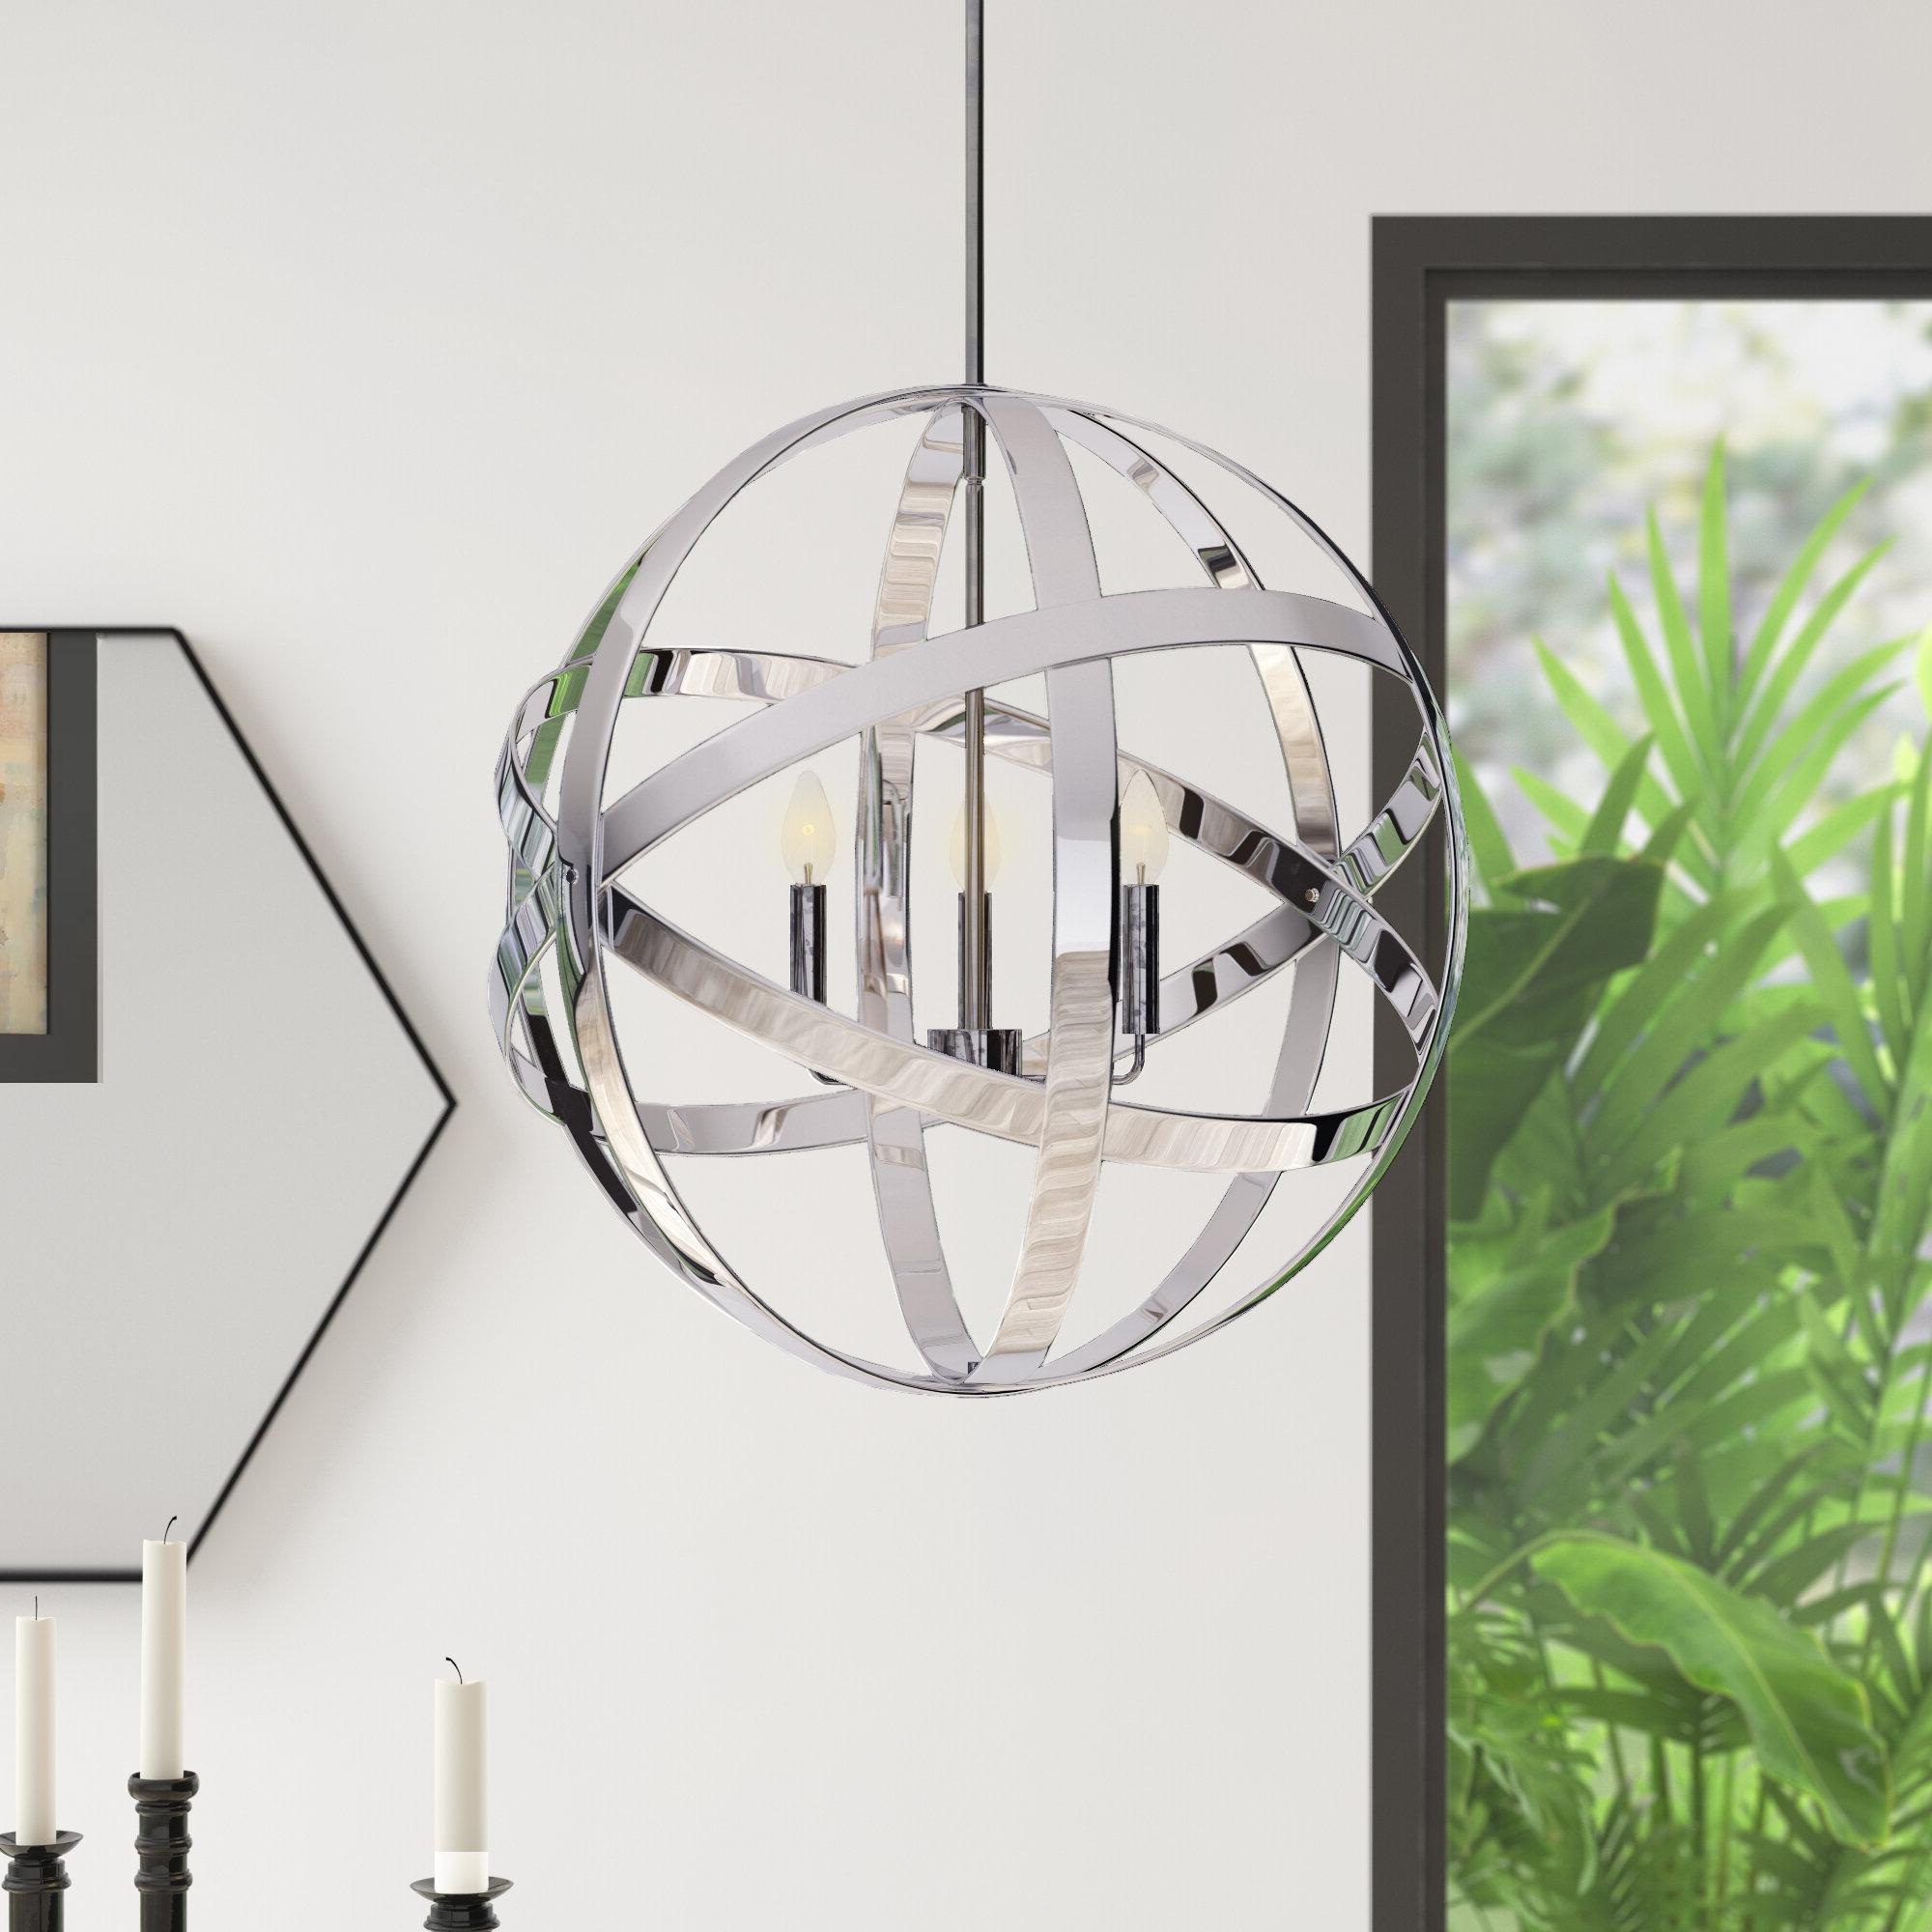 Curcio 3 Light Globe Chandelier For 2020 Adcock 3 Light Single Globe Pendants (View 10 of 25)